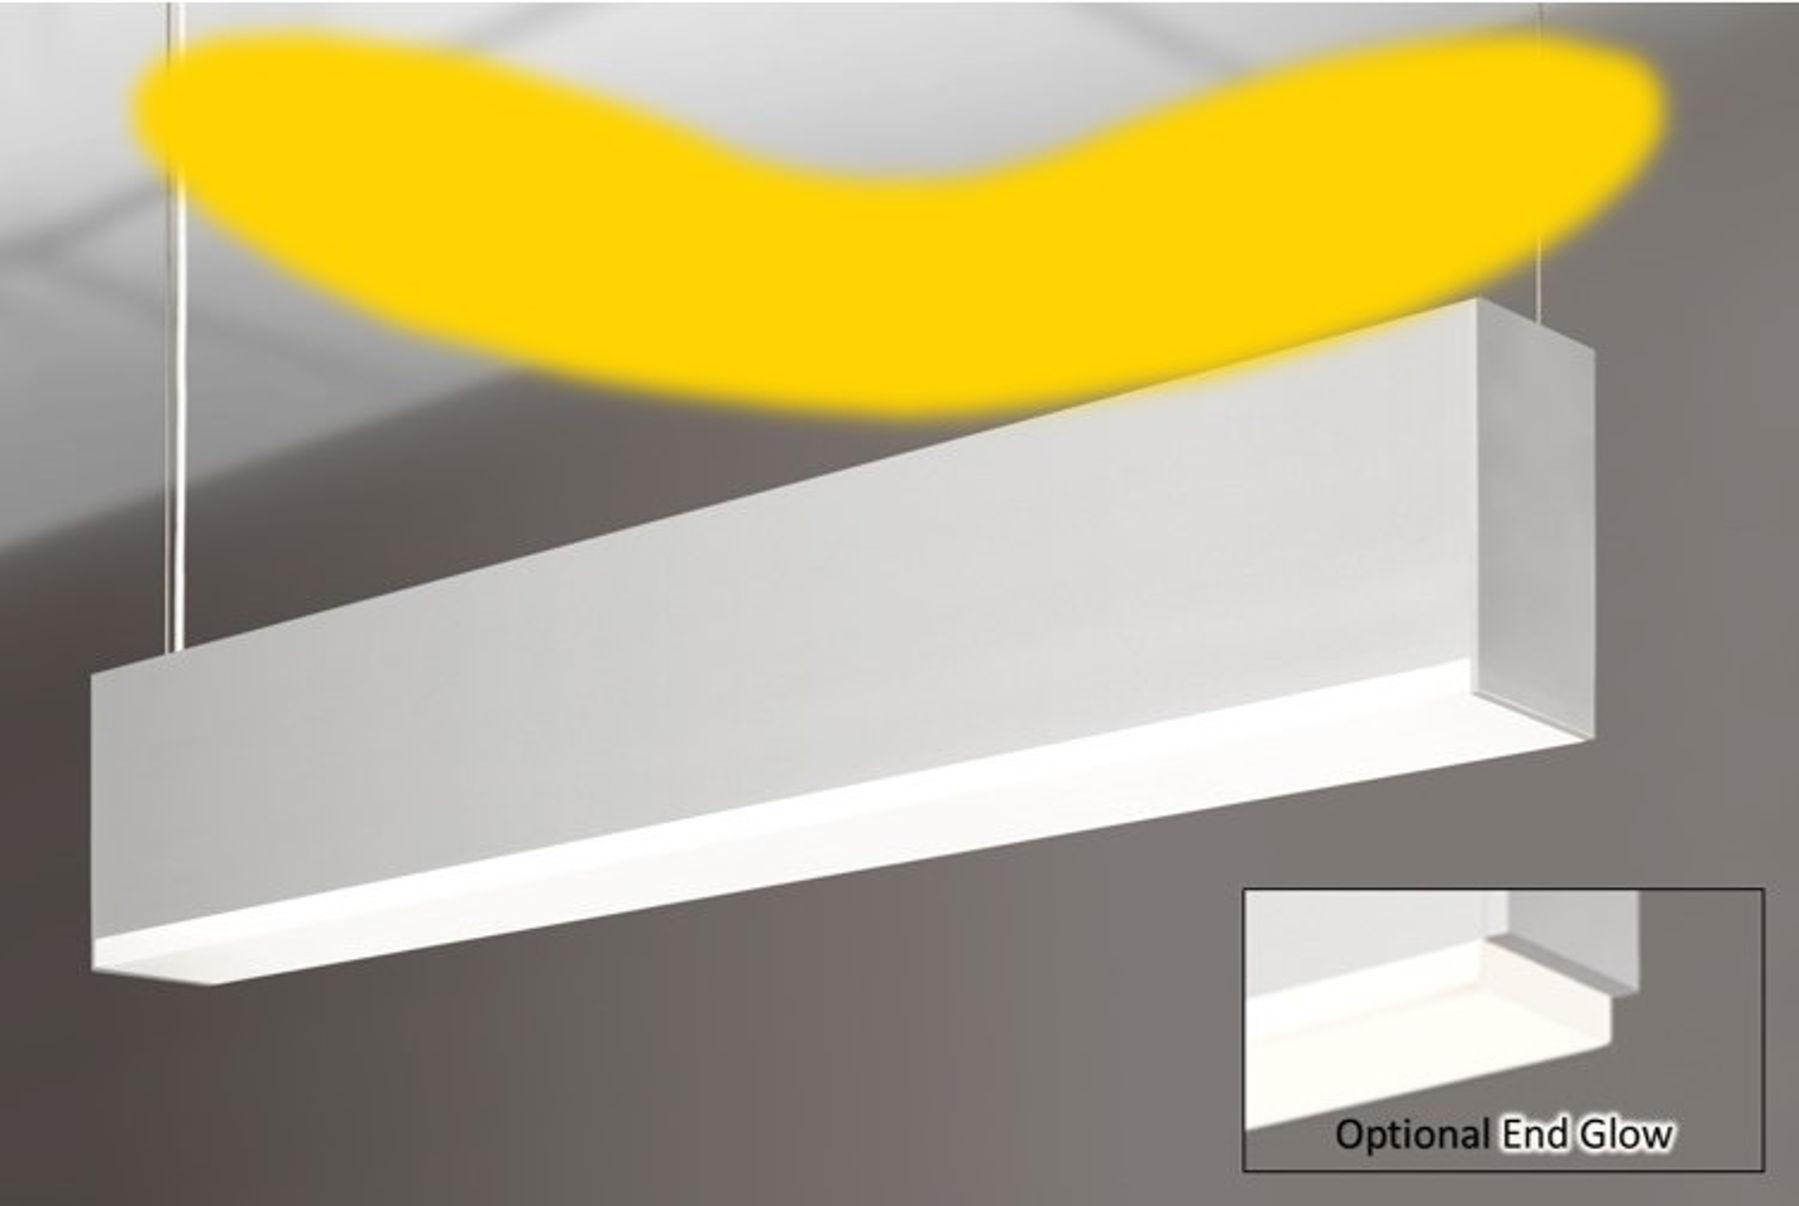 Picture of GX3D45B2-LED-GGO-LENS3D